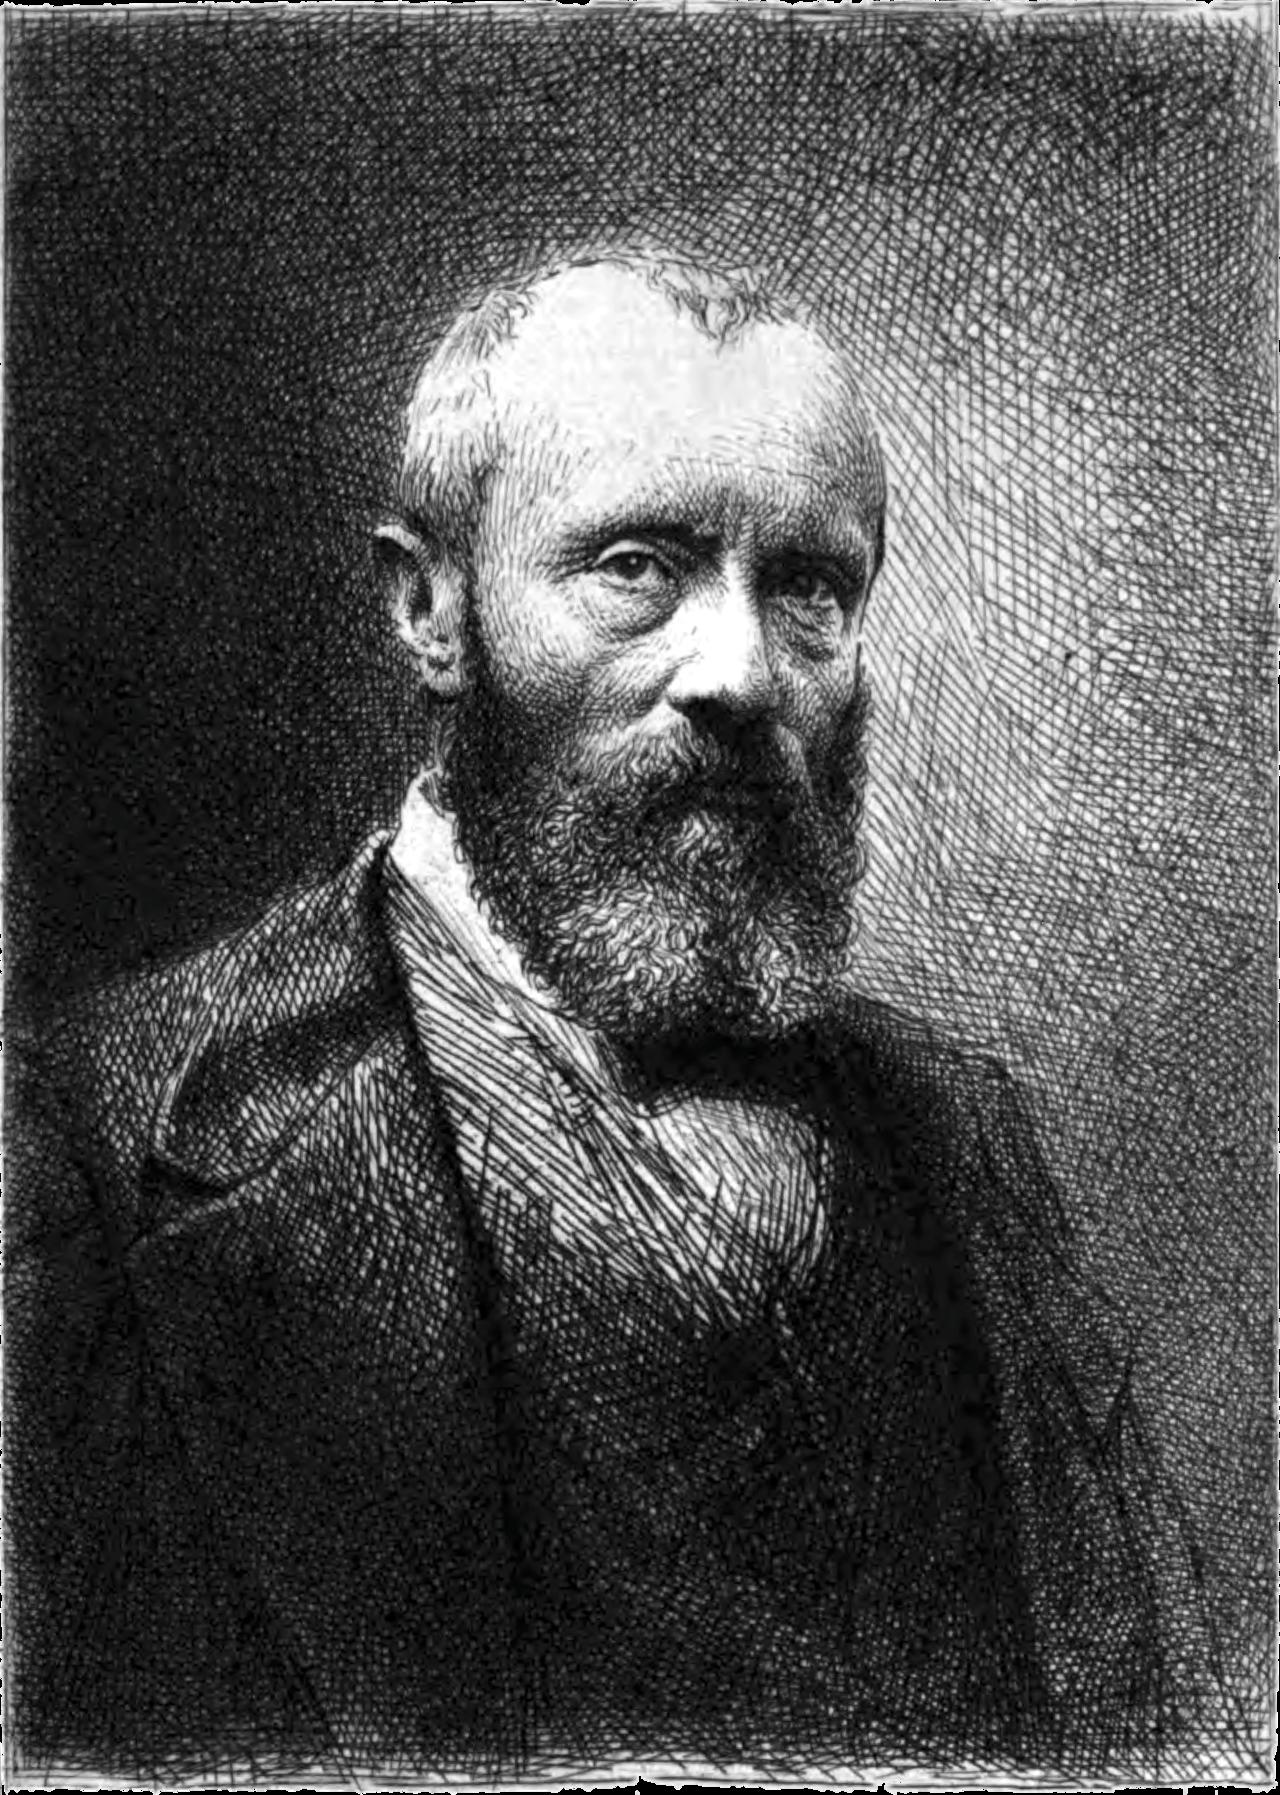 Engraving of Théophile Thoré-Bürger (1807-1869), French art critic